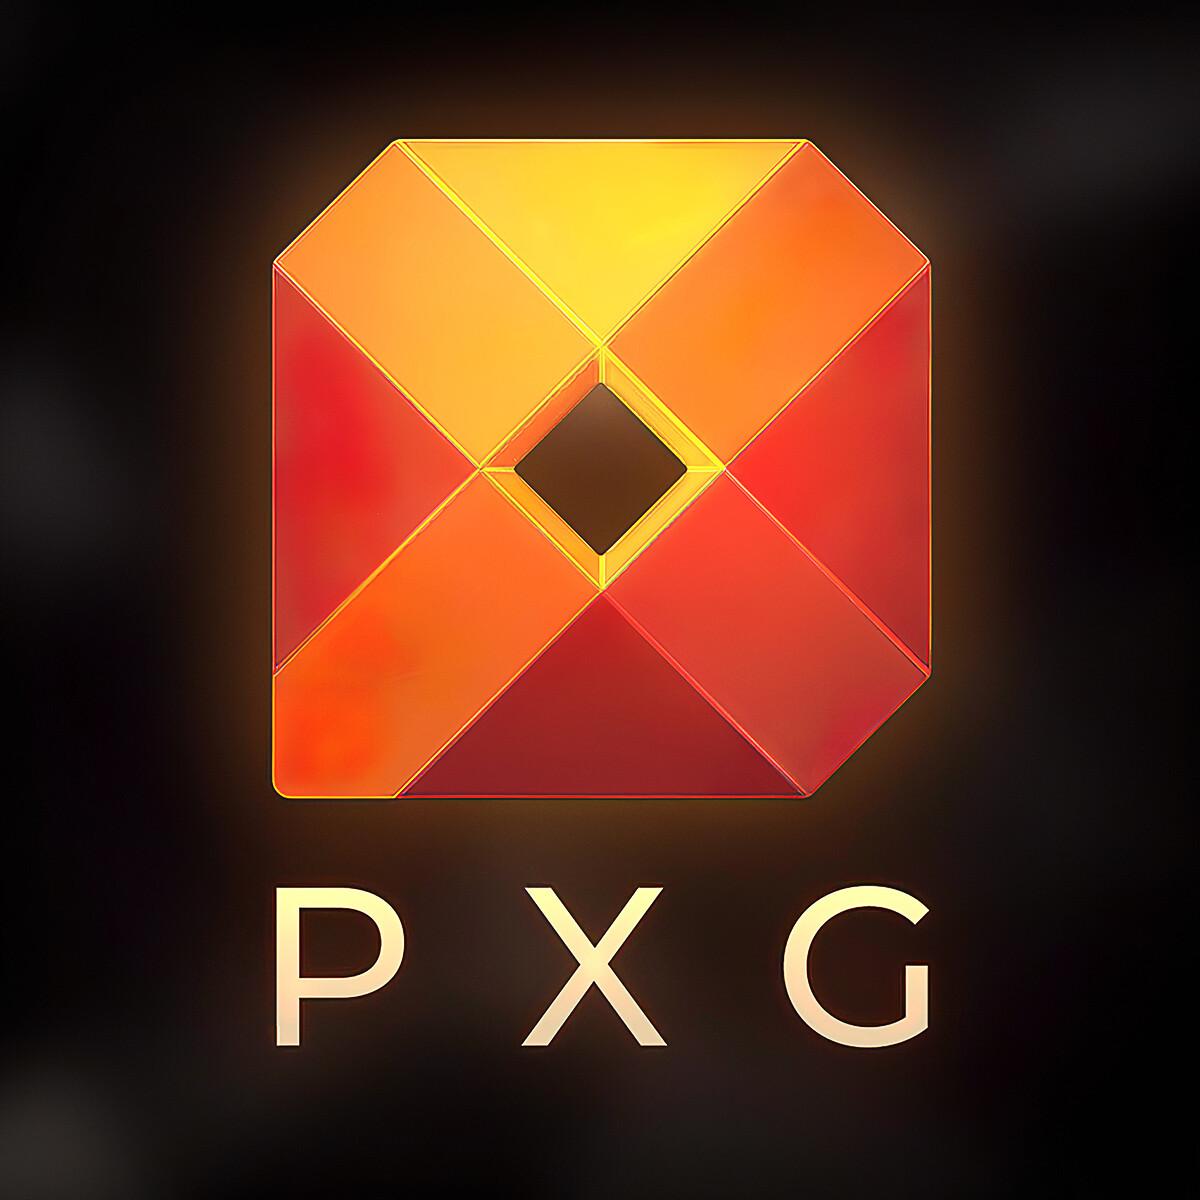 🕋 P X G 🕋